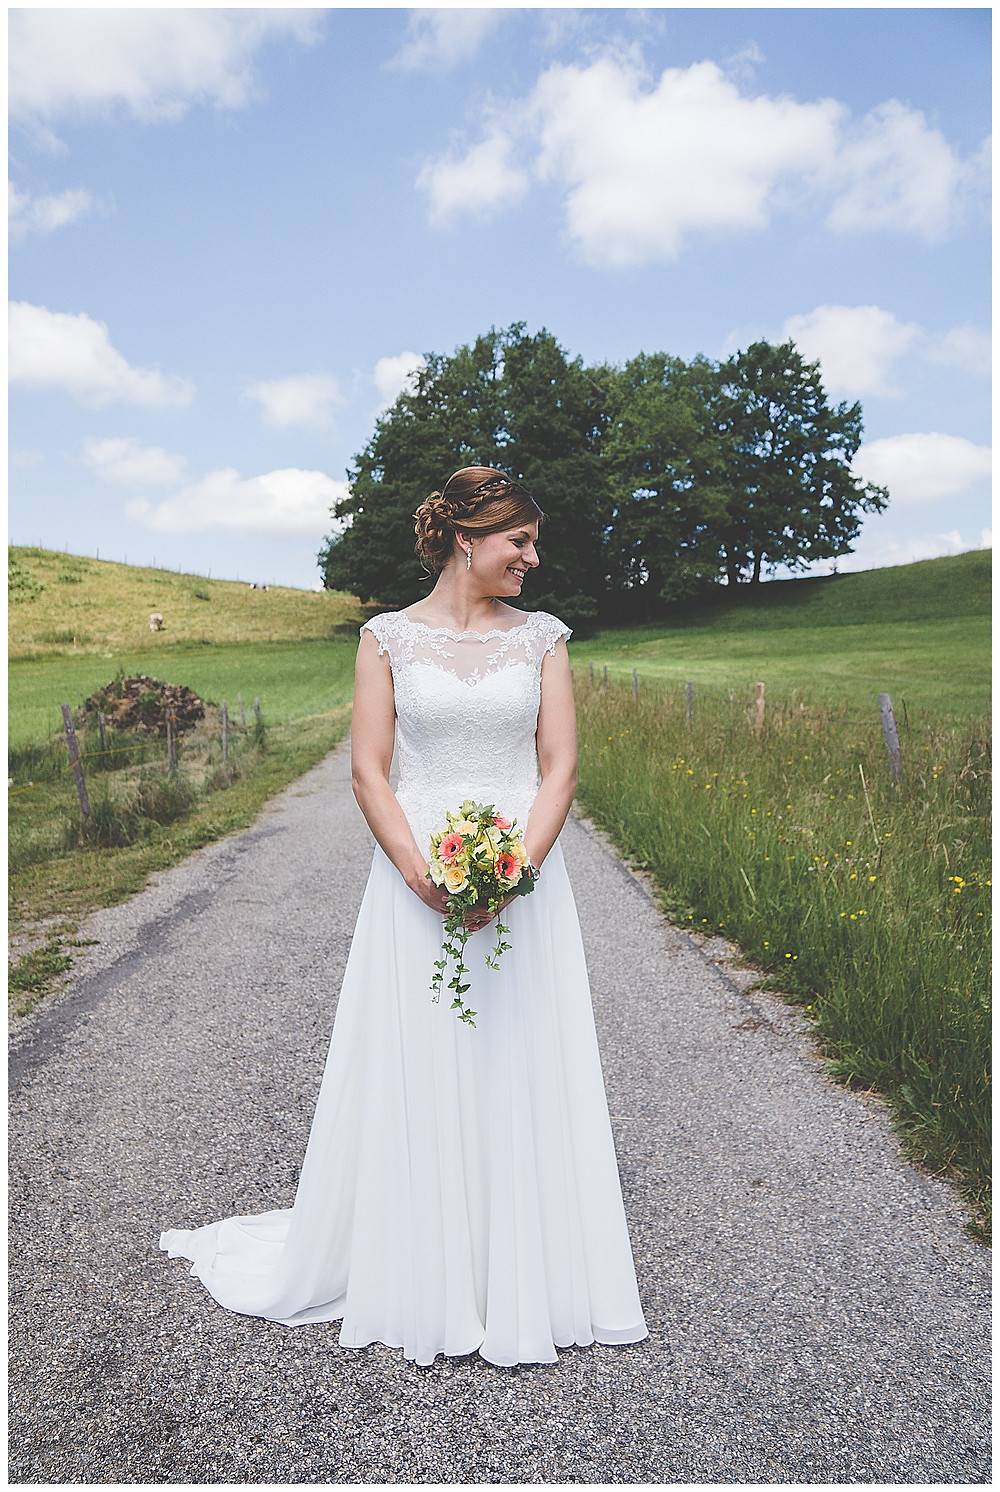 Brautportrait im Allgäu